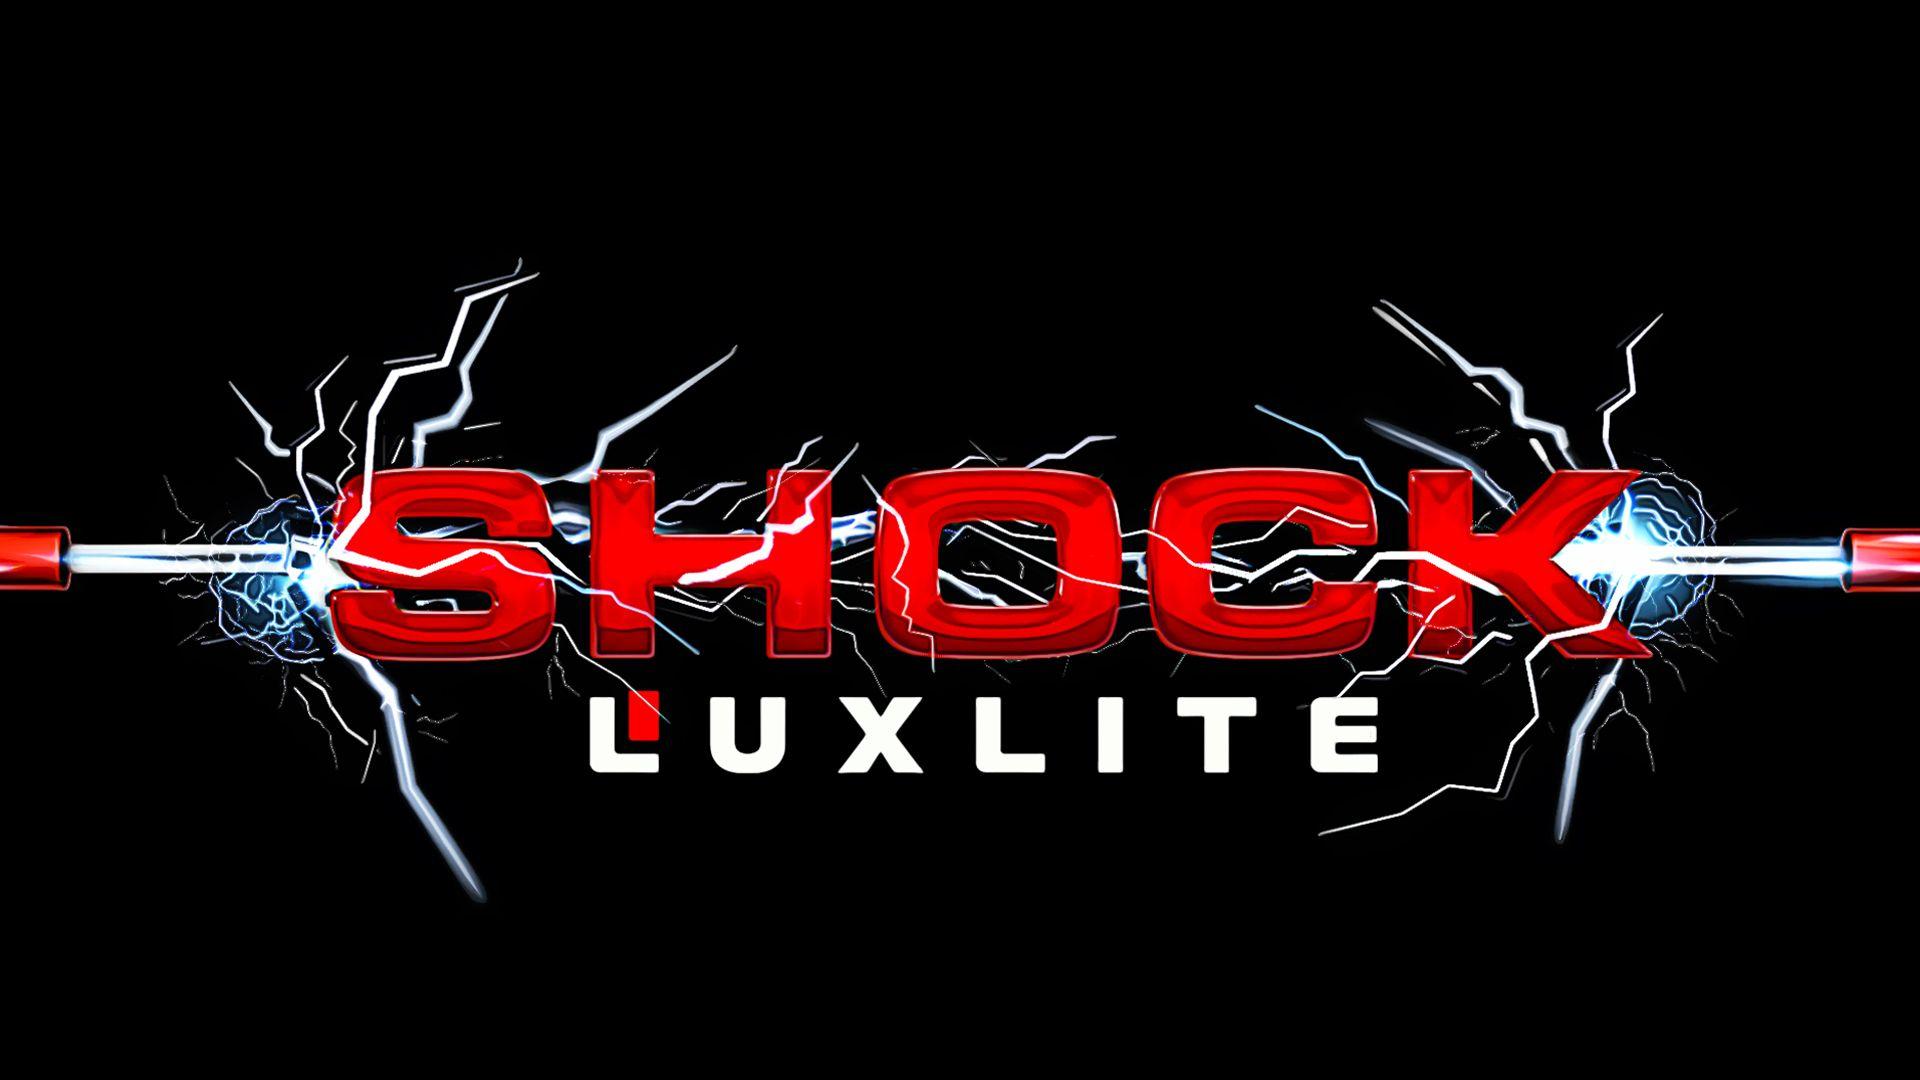 Логотип для батареек LUXLITE SHOCK - дизайнер gromiastorm